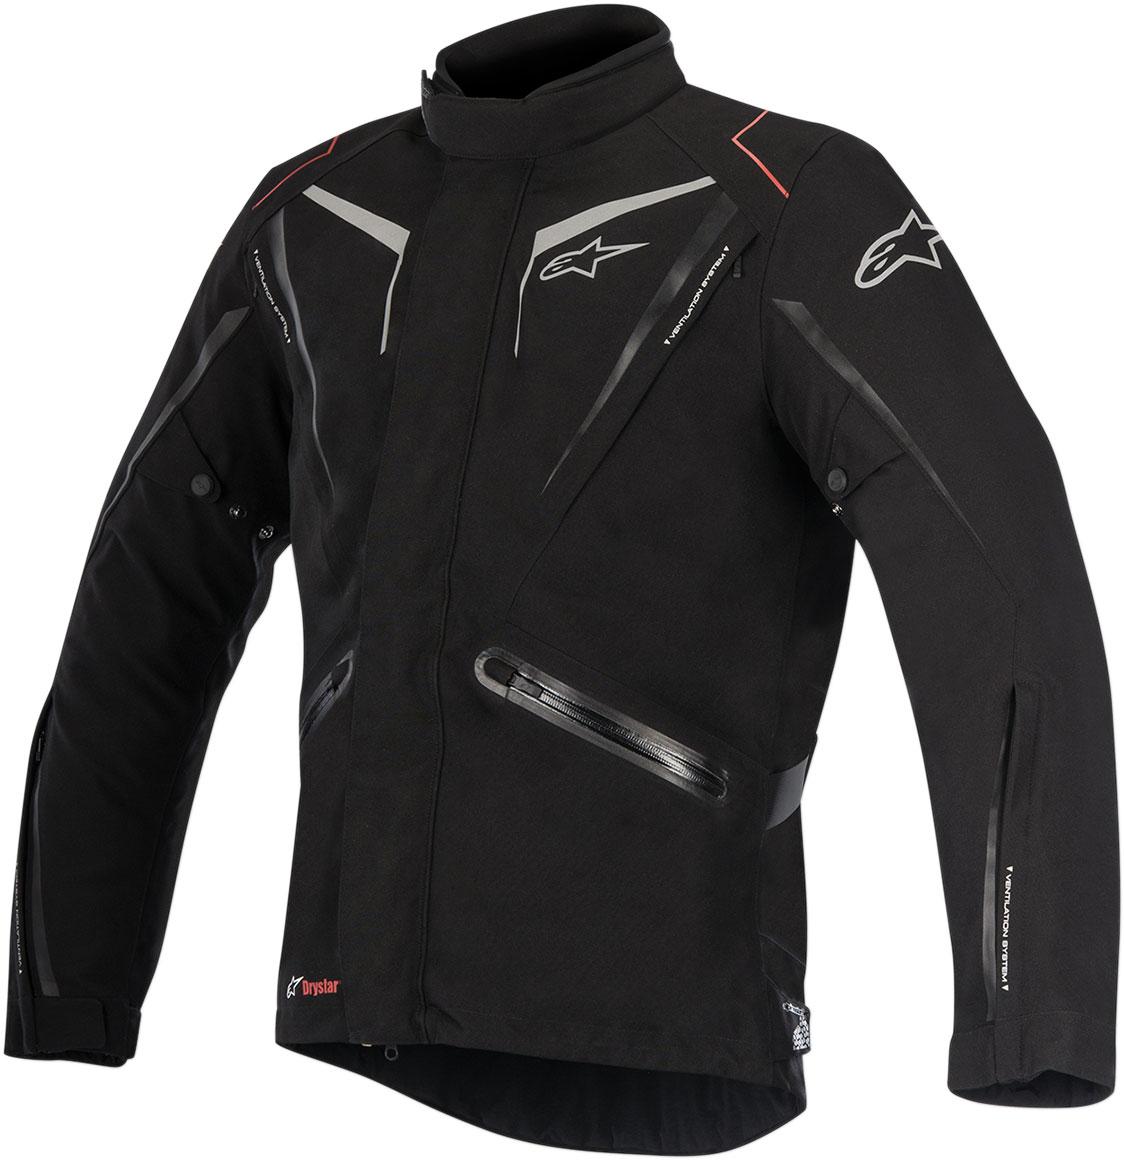 Alpinestars YOKOHAMA Drystar Adventure-Touring Jacket (Black)